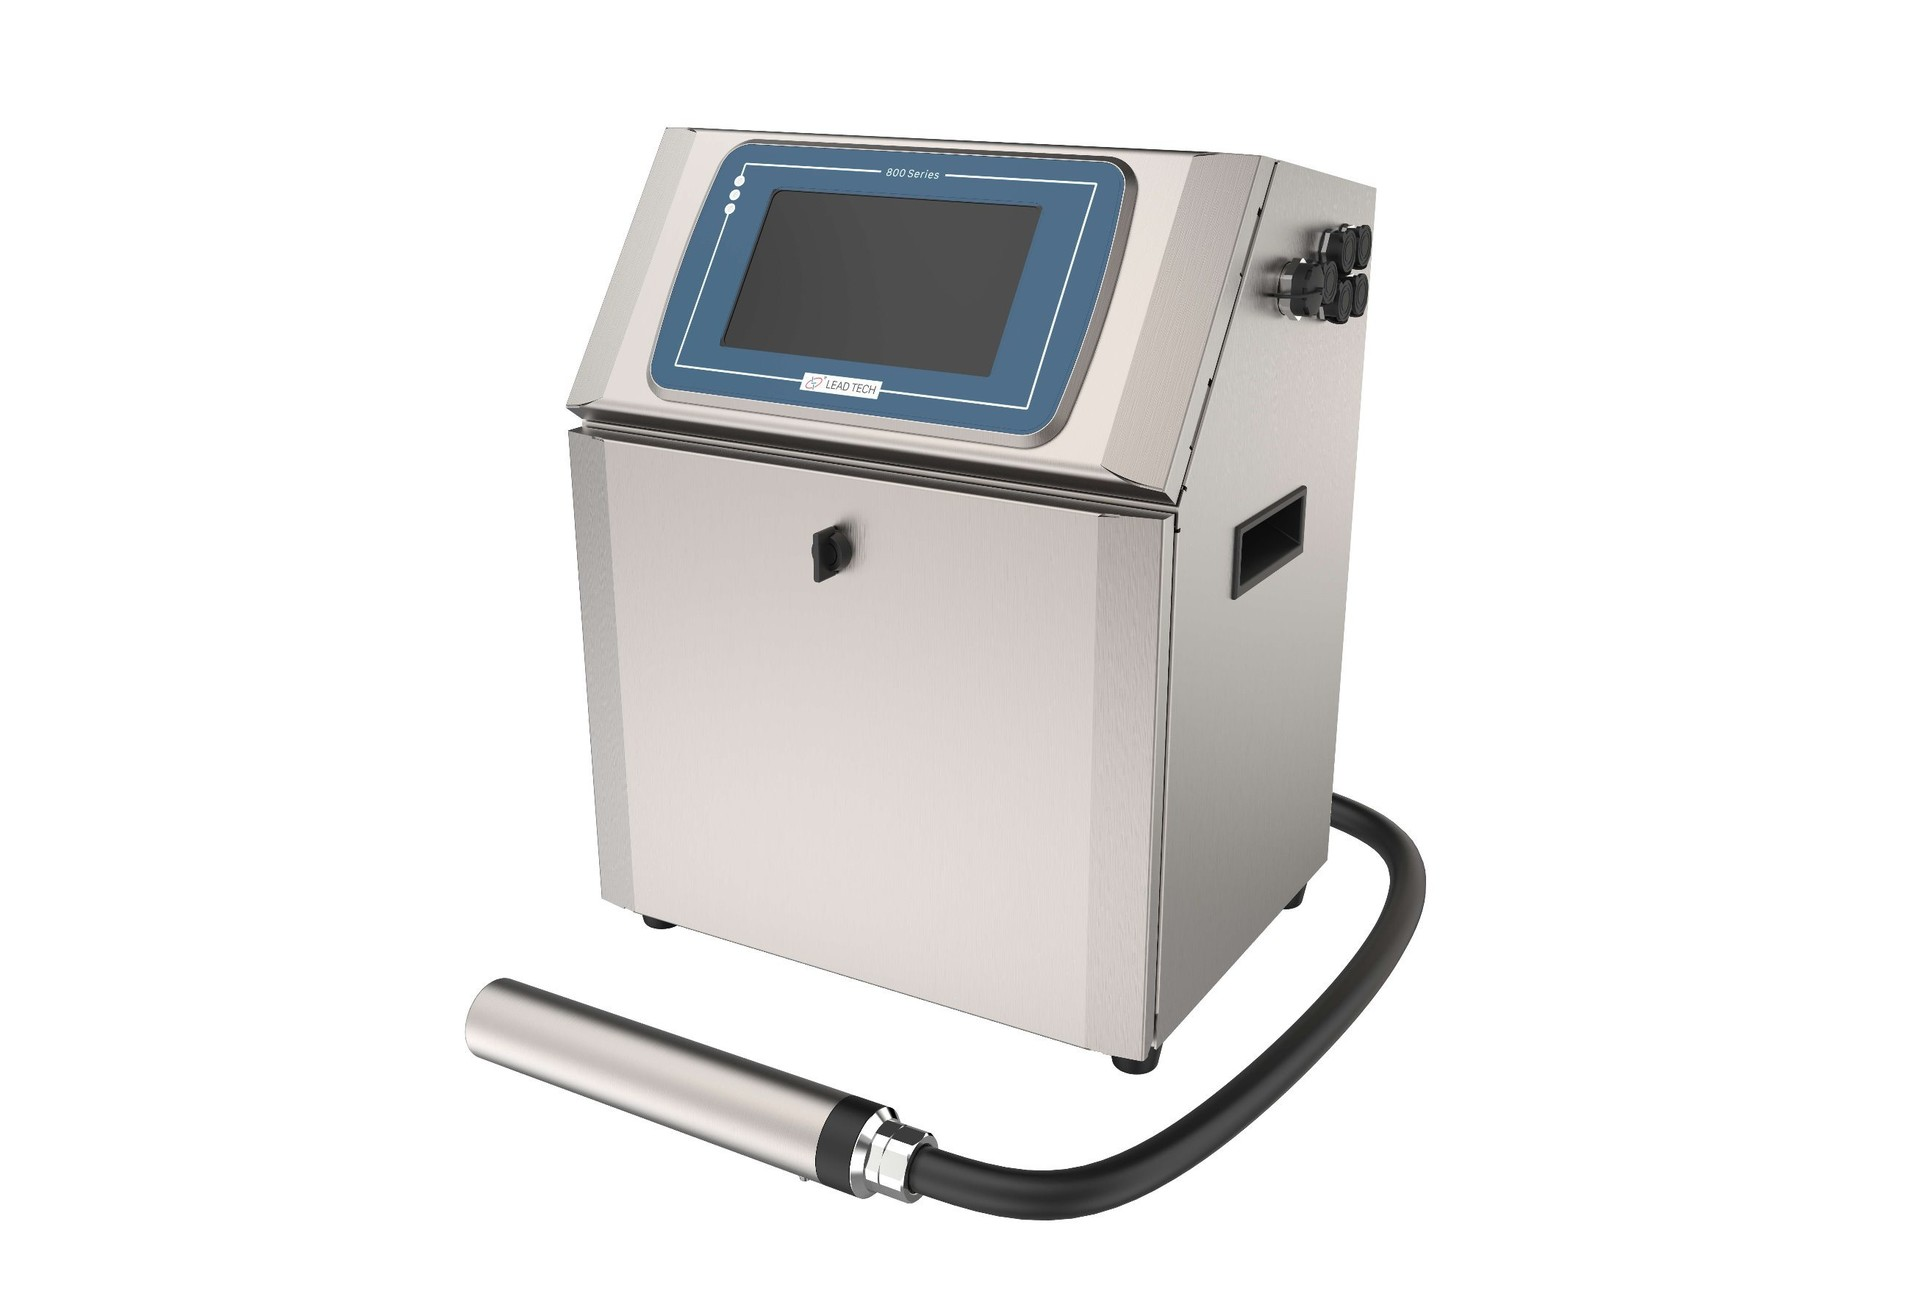 Lead Tech Lt800 Expiry Date Printing Coding Cij Inkjet Printer